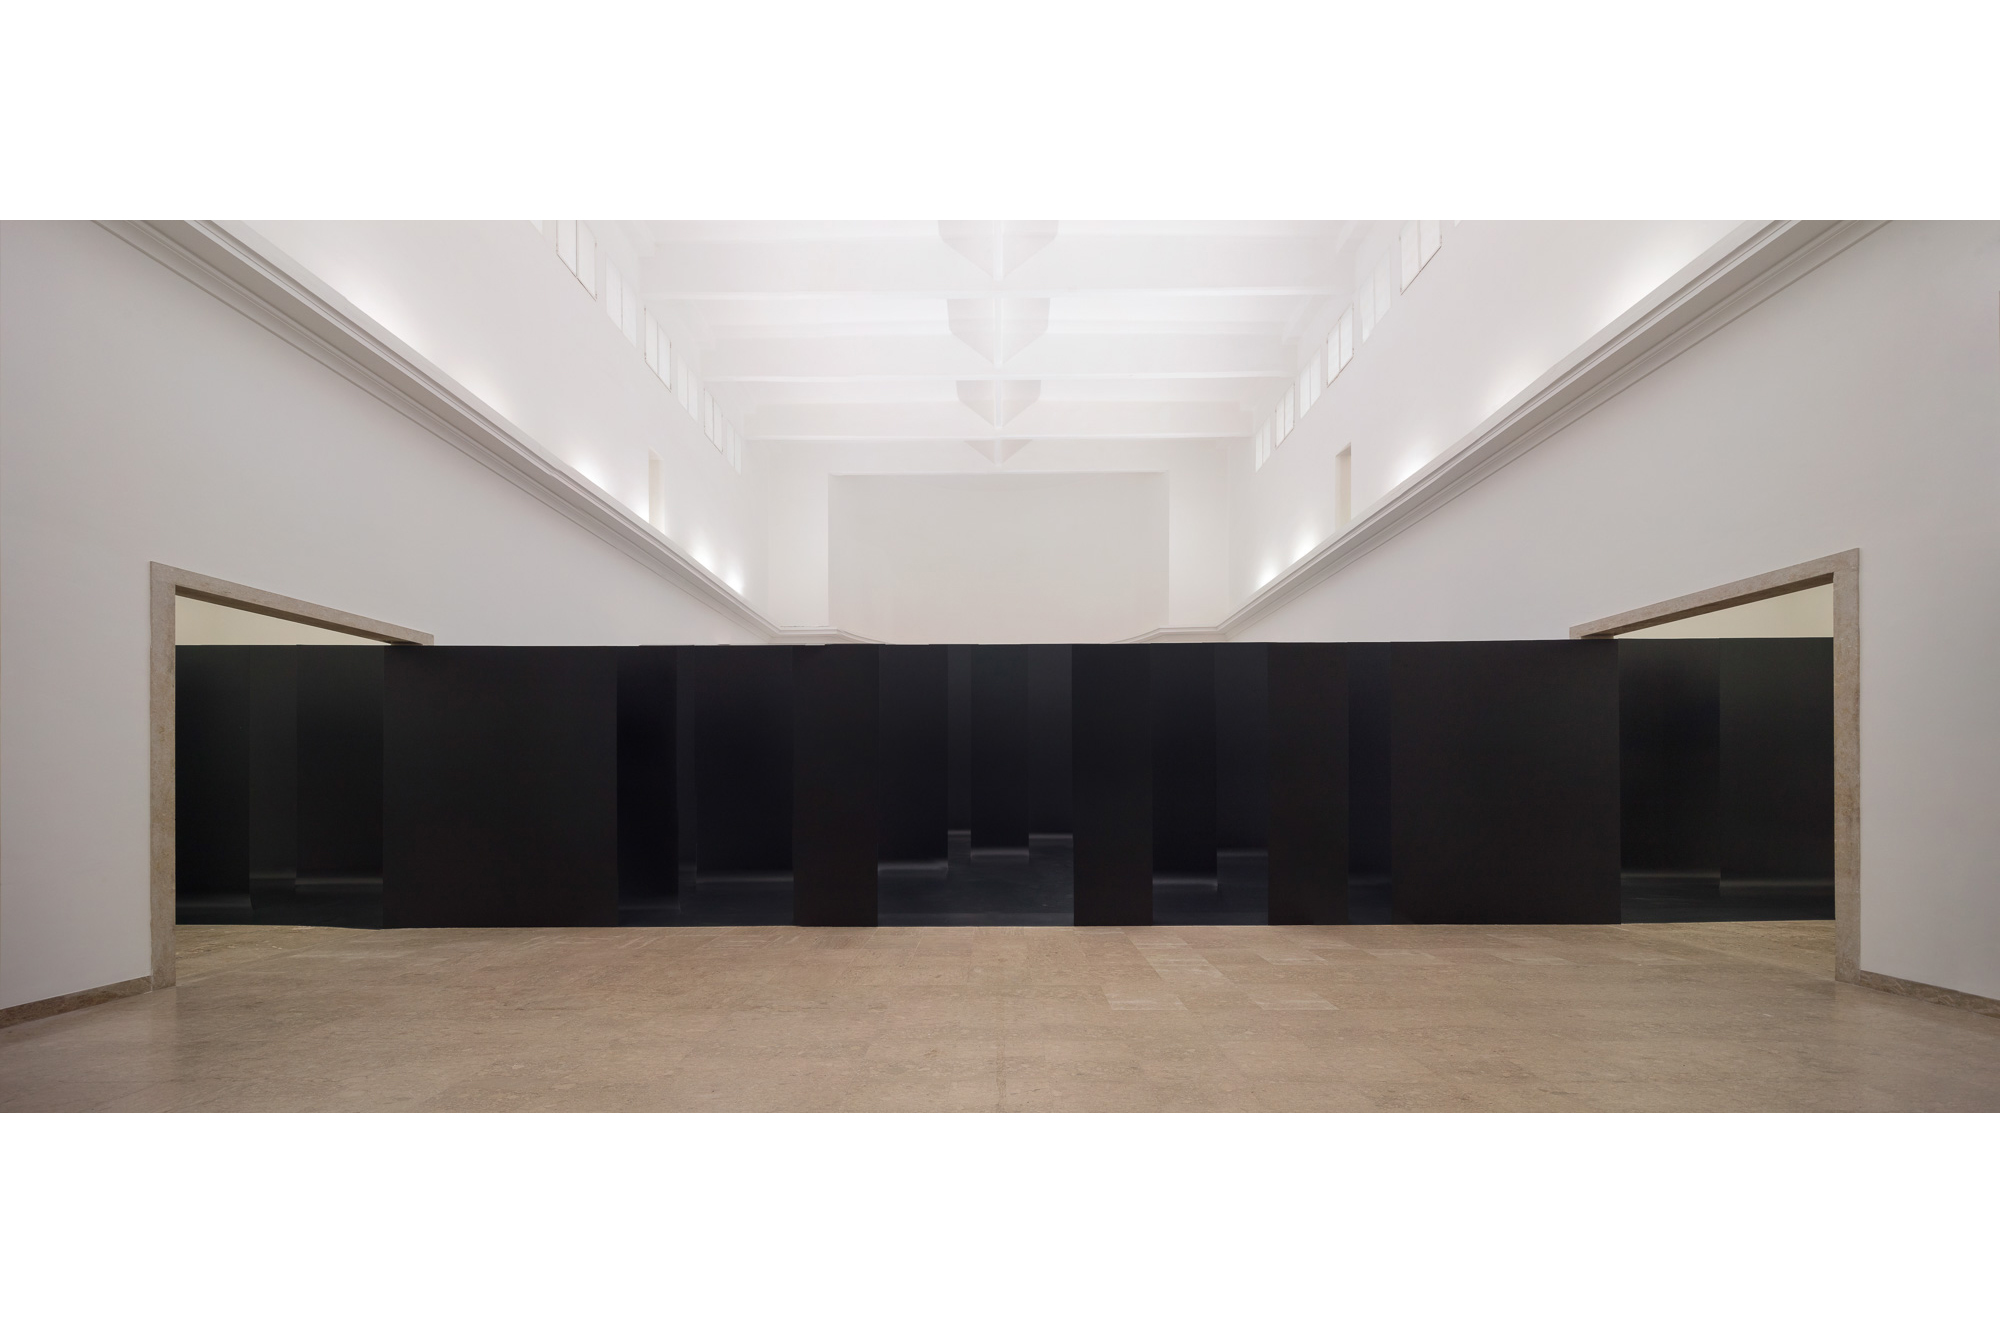 07-German Pavilion-Biennale Architettura 2018-c-Jan Bitter-1